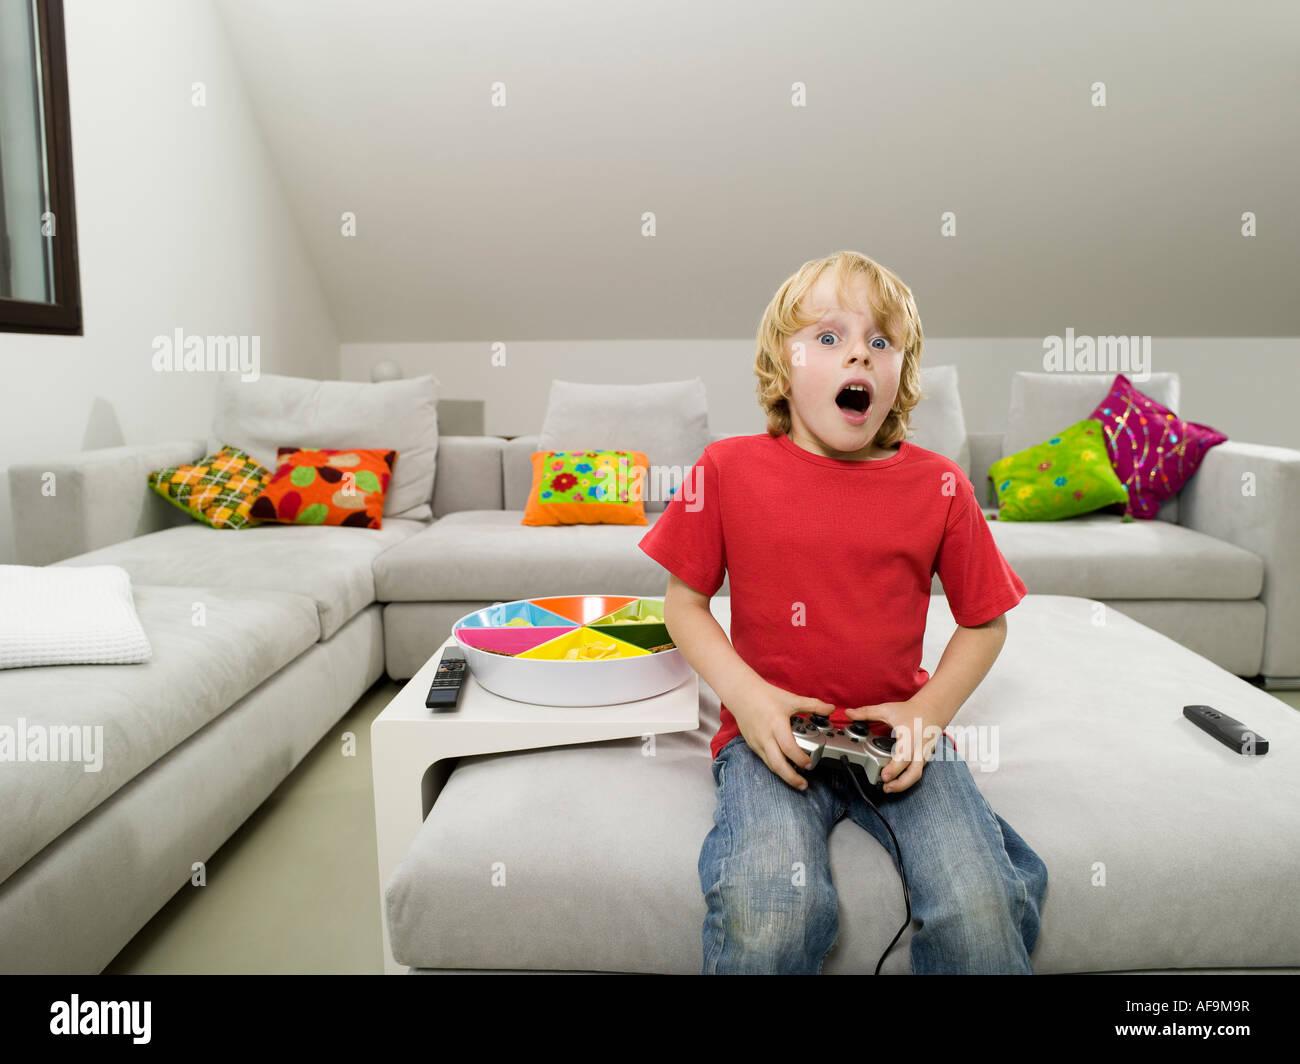 boy-playing-computer-game-AF9M9R.jpg